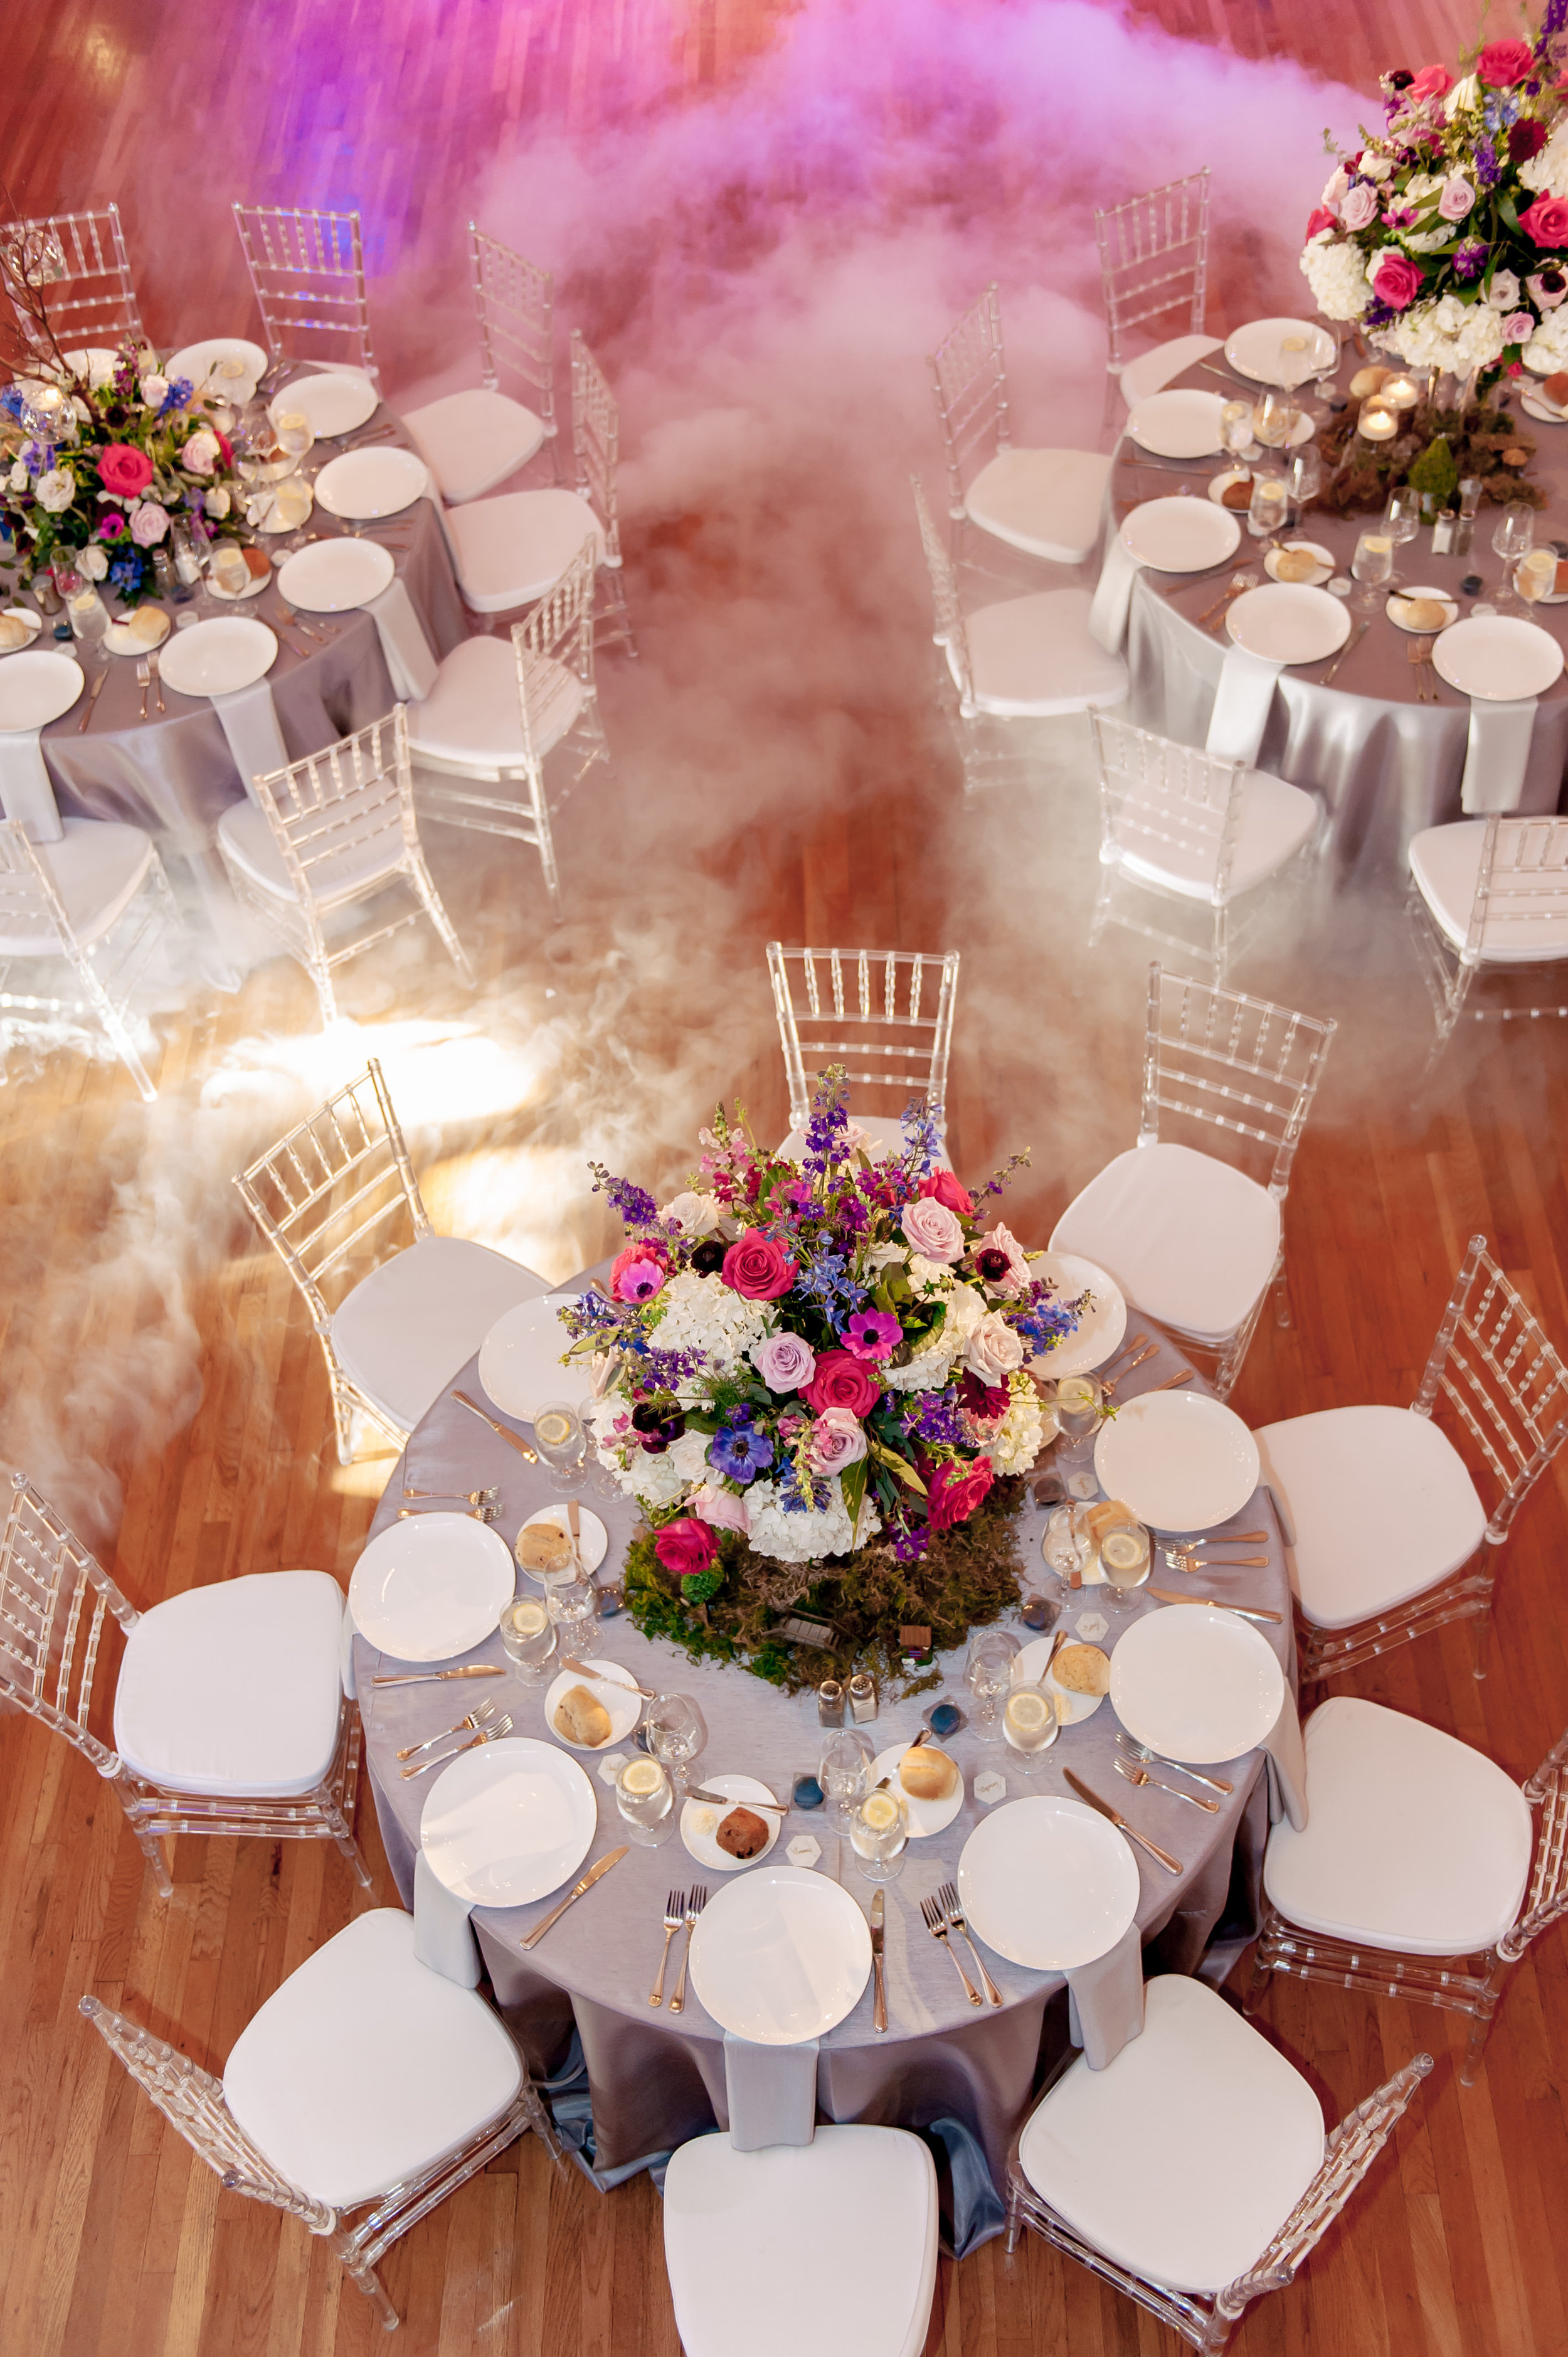 www.santabarbarawedding.com | Rewind Photography | Rockwood Women's Club | Burlap & Bordeaux | Amigo Party Rental | Space-Inspired Reception Tables